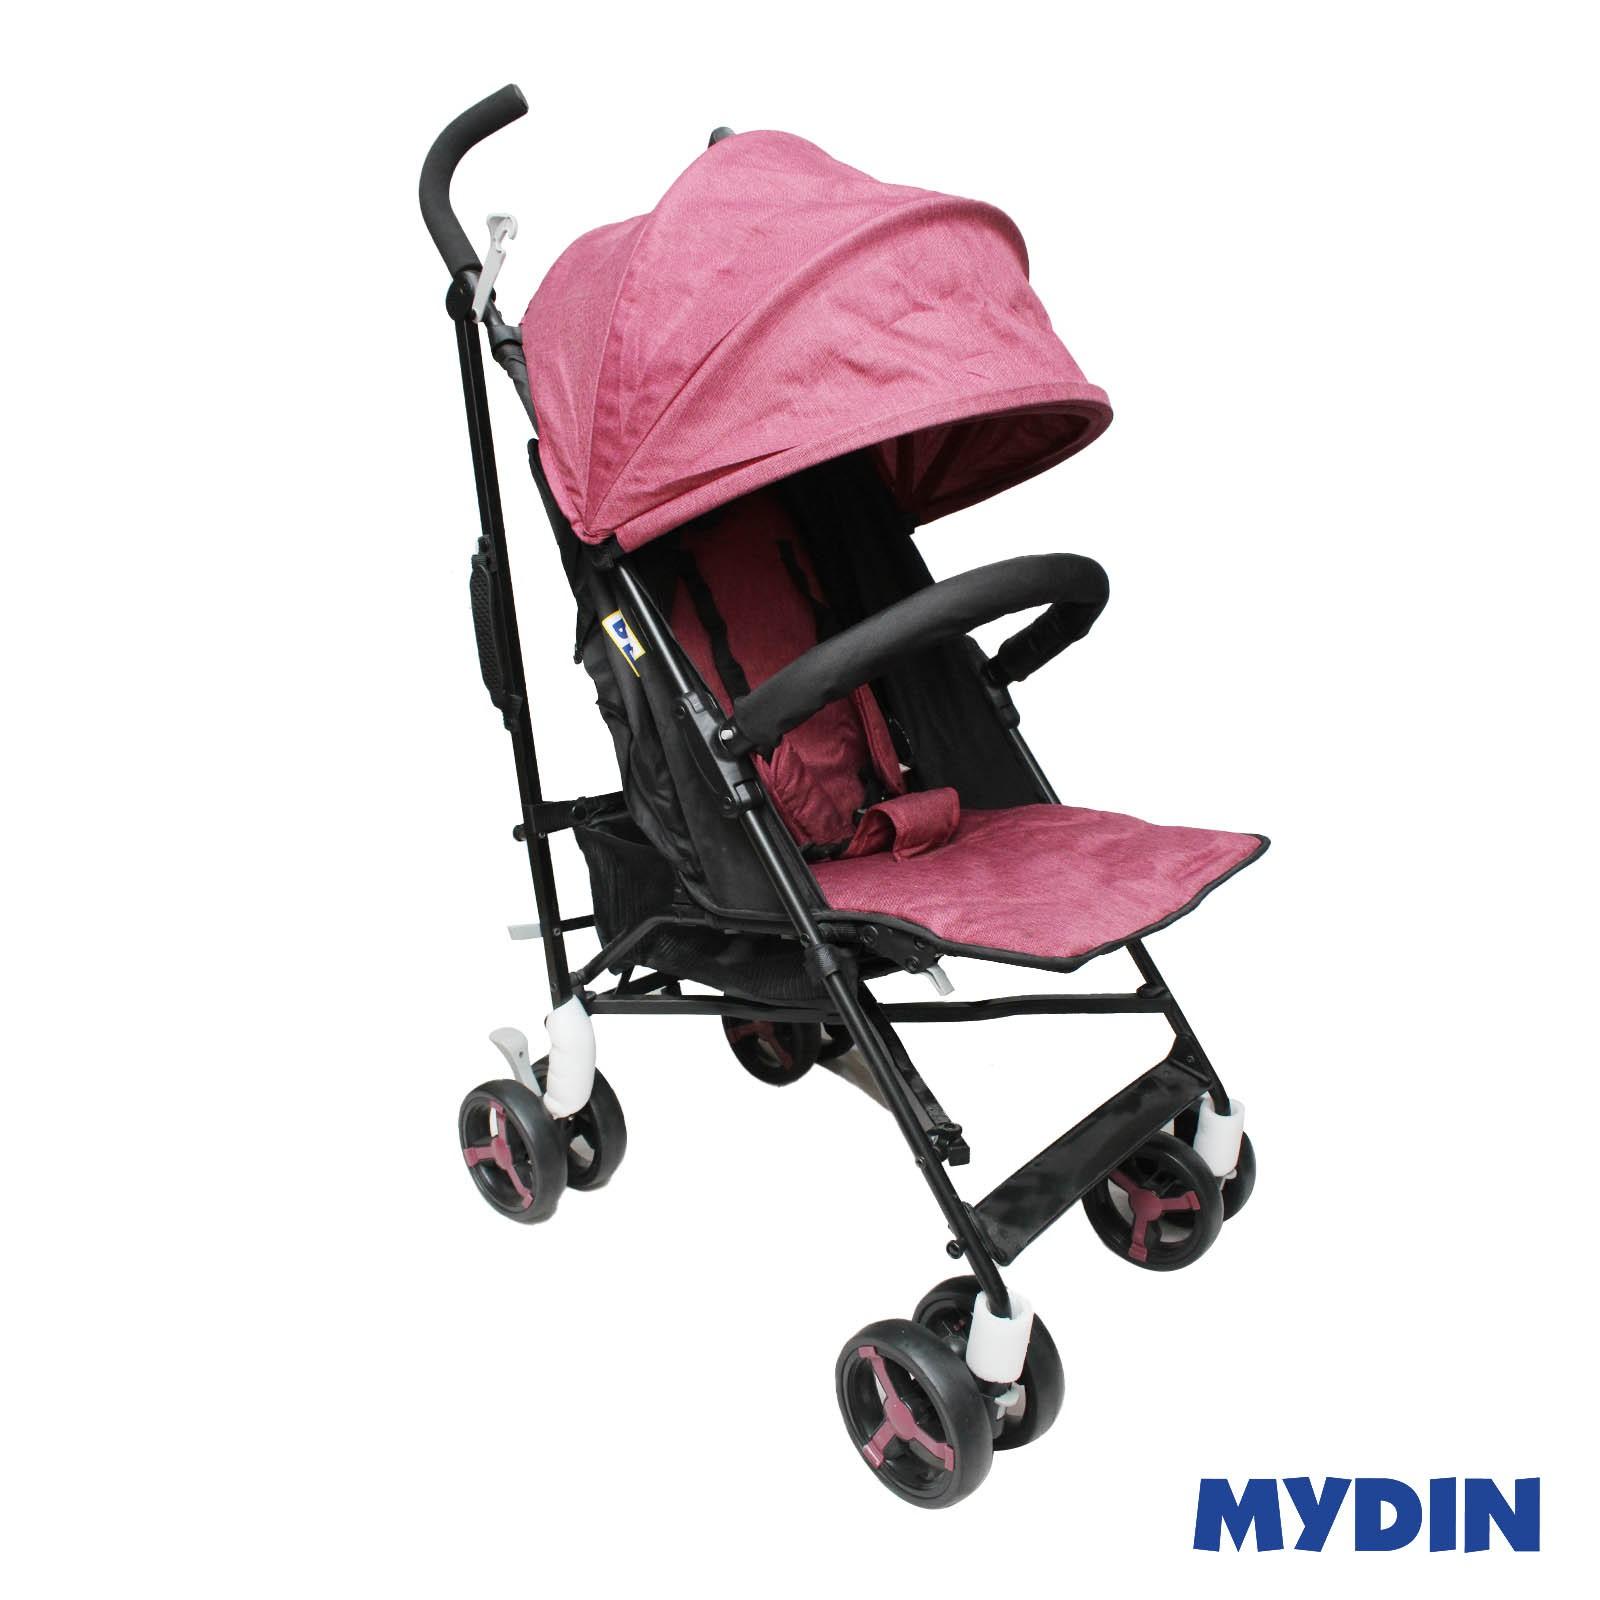 MYBB Baby Umbrella Stroller 0418SAHBCP02 (2 Variants)